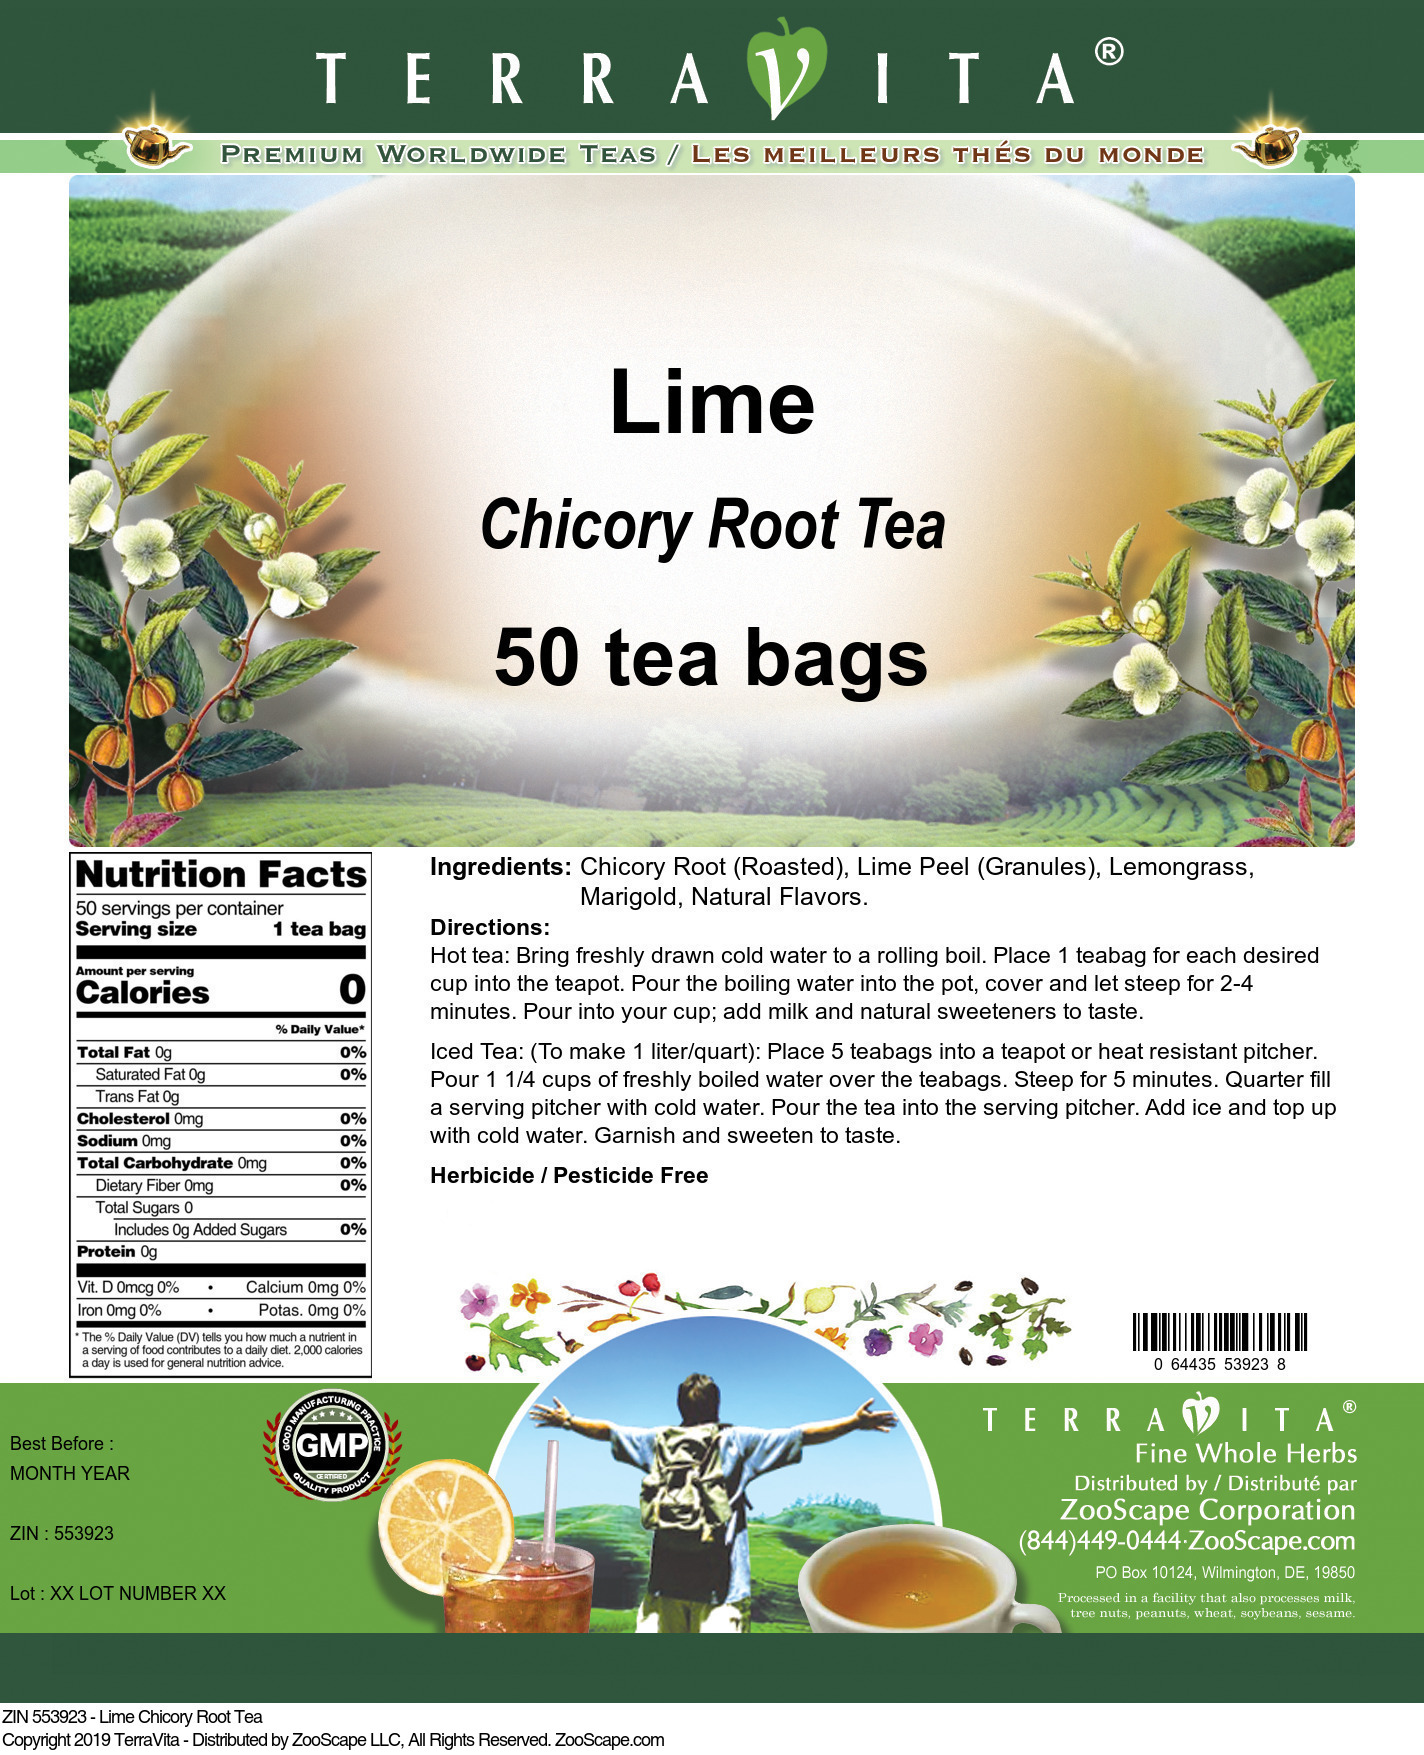 Lime Chicory Root Tea